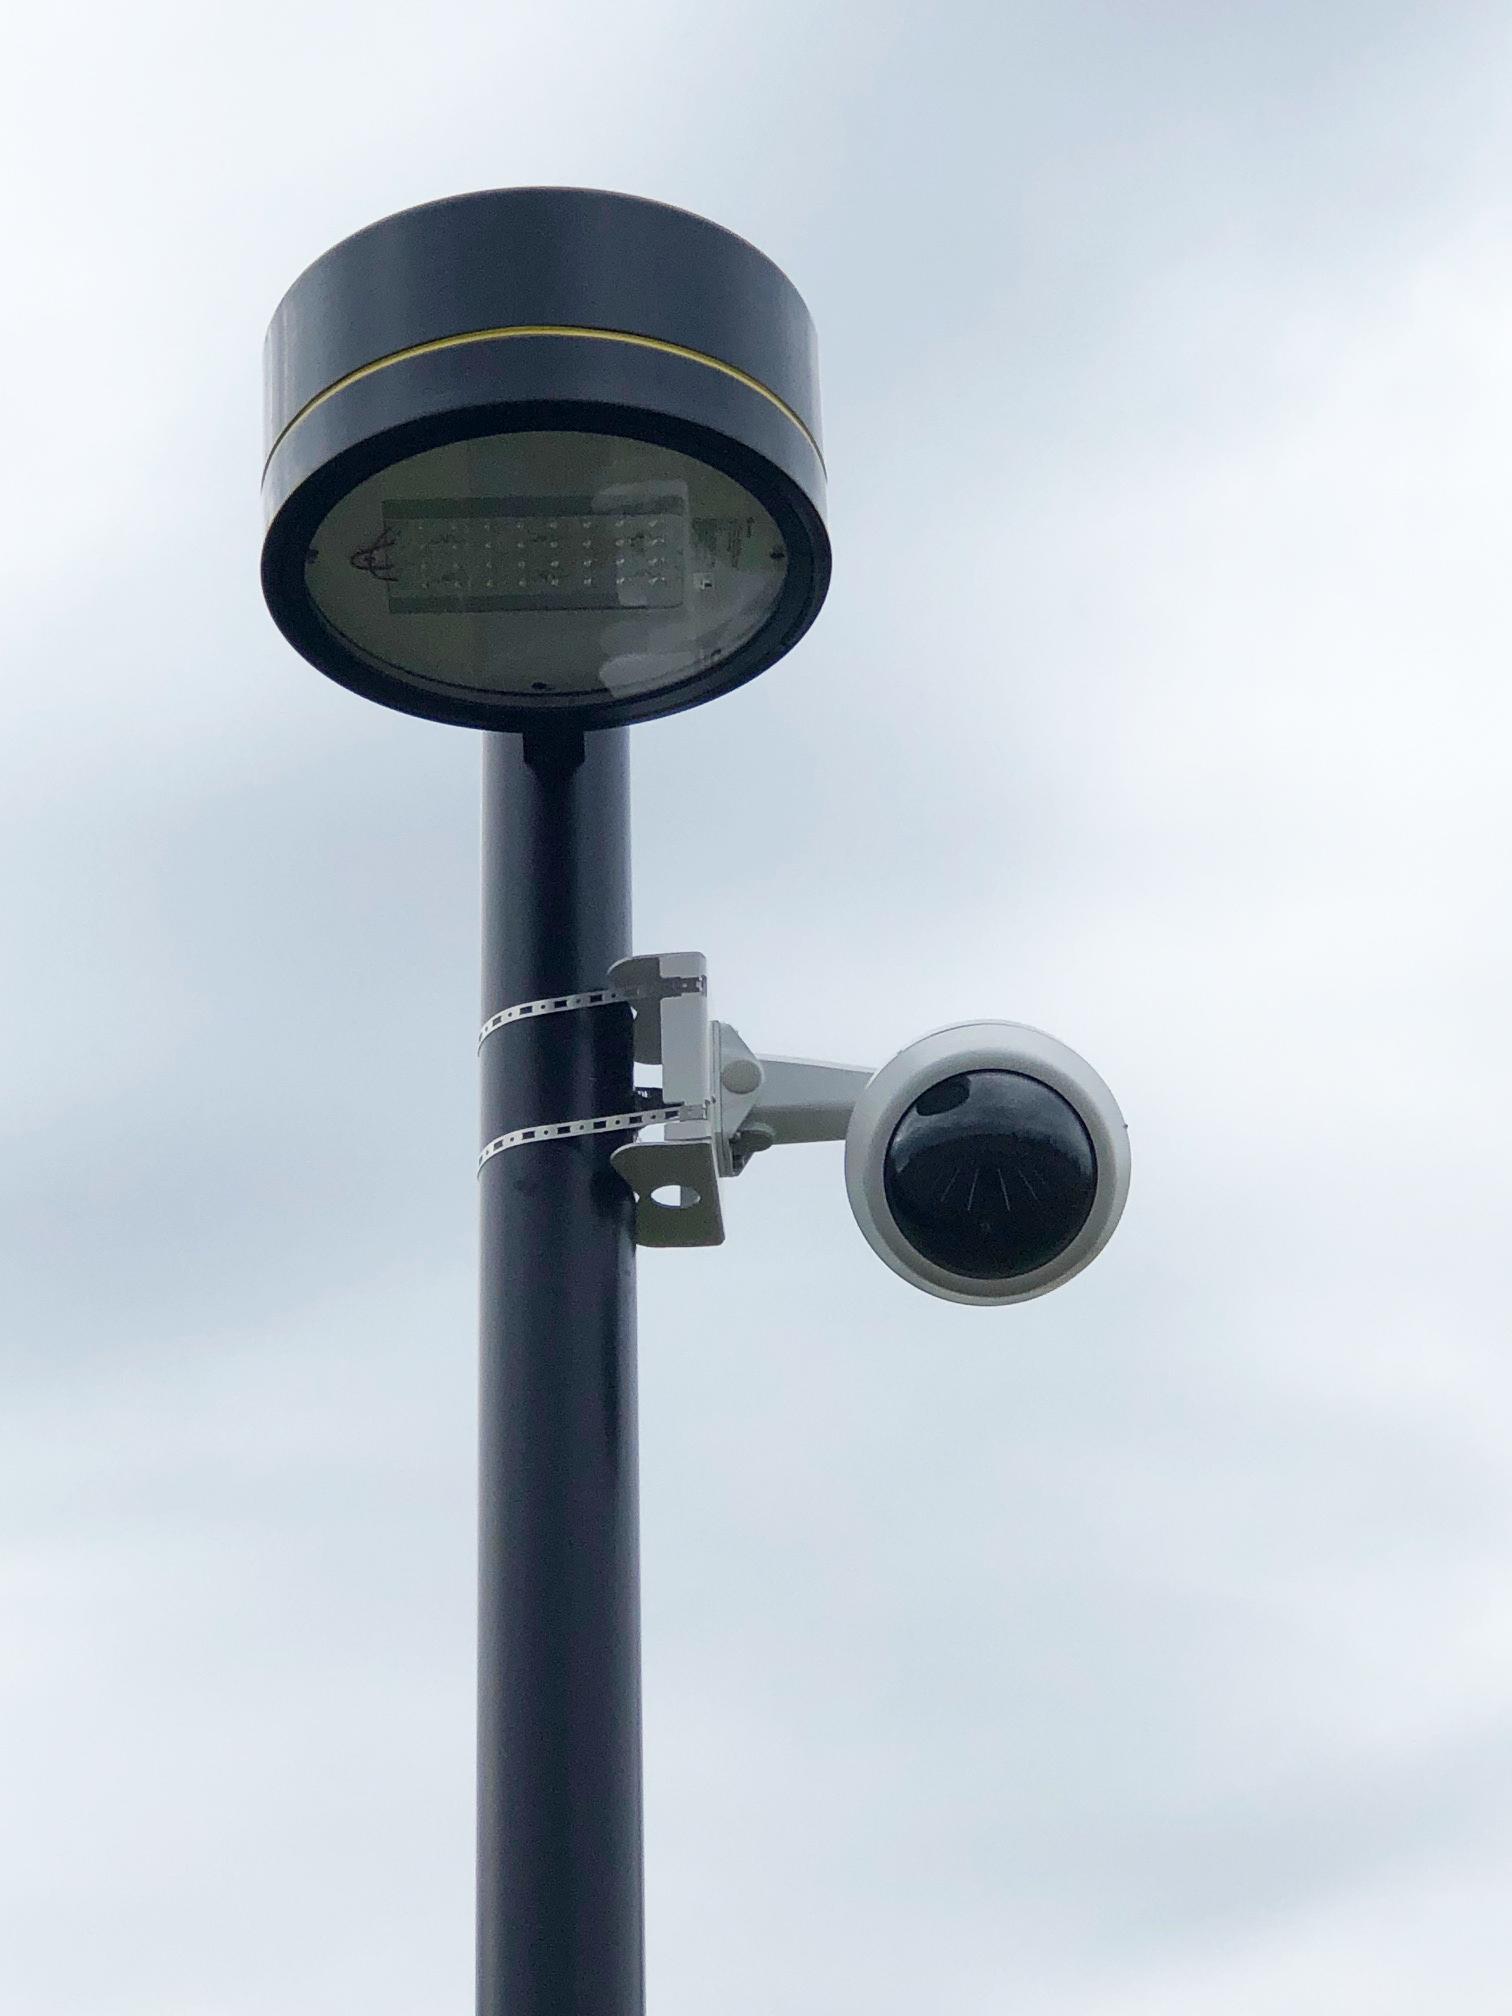 Custom Security Cameras / Mounts